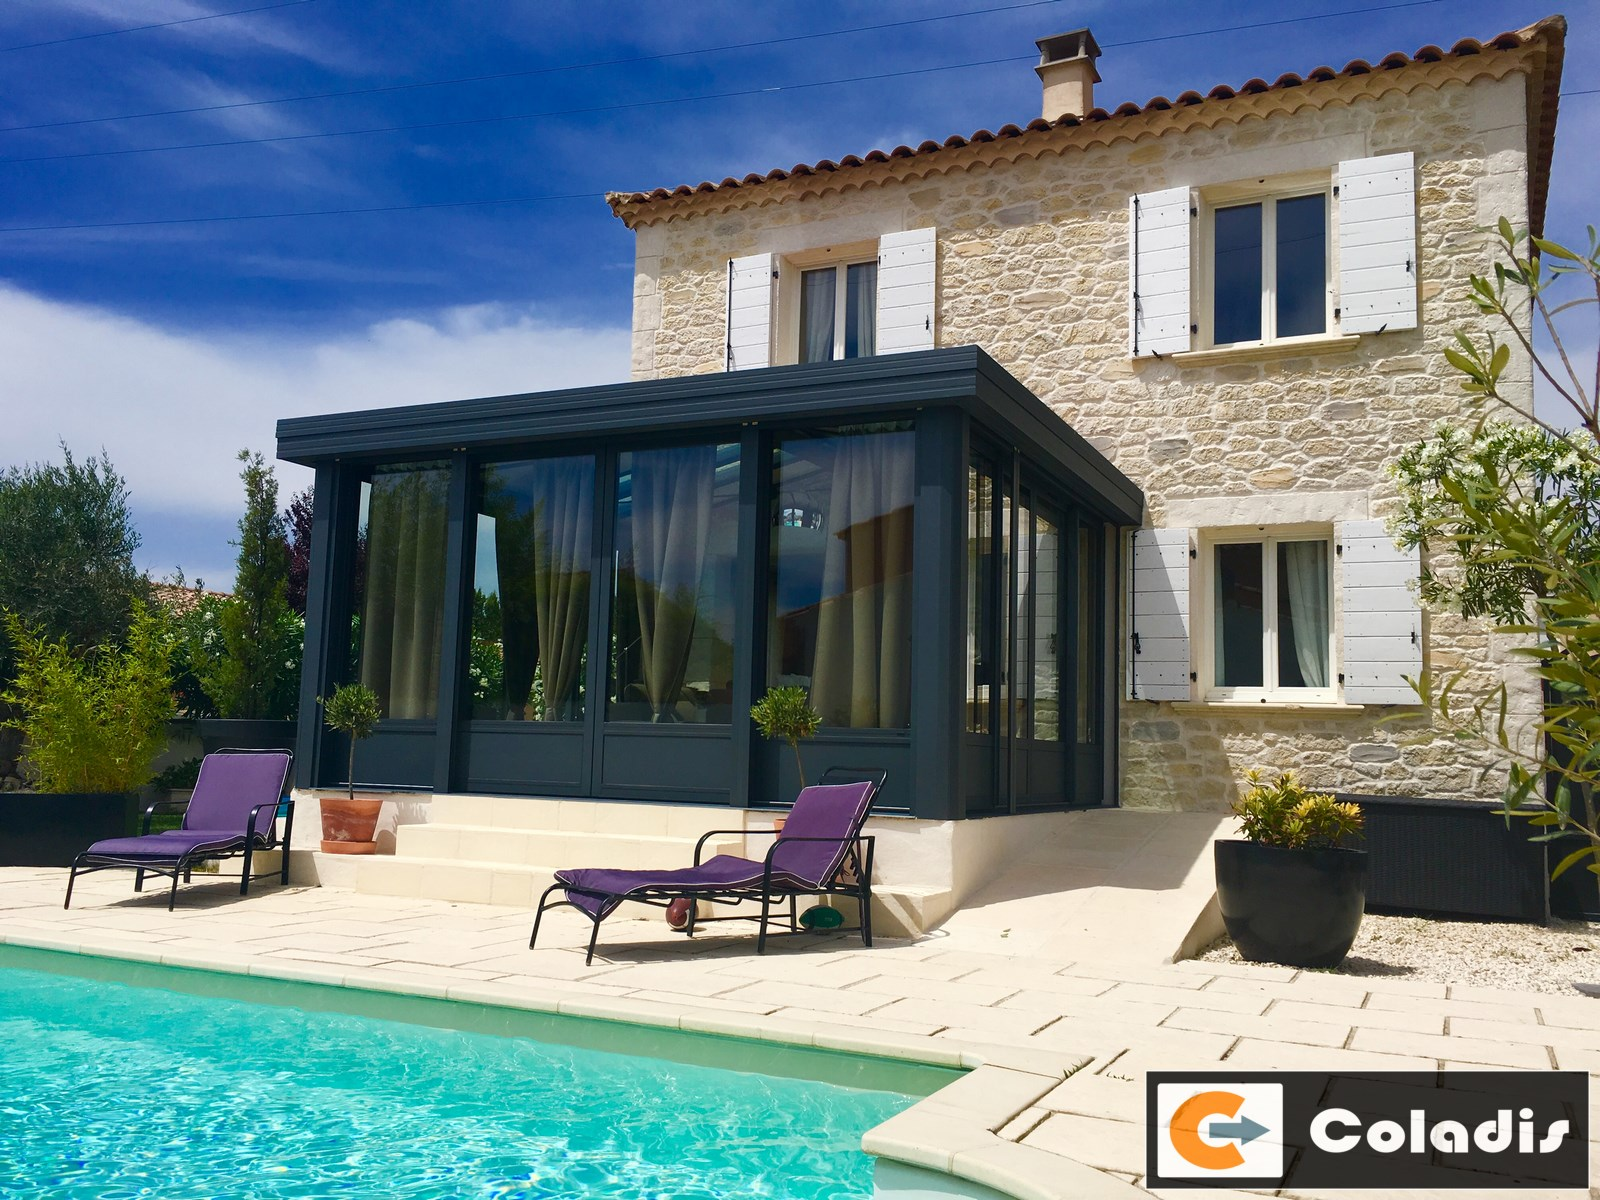 Installateur Fabricant Poseur De Veranda Design Isolante Montpellier A Cote De Mauguio Coladis